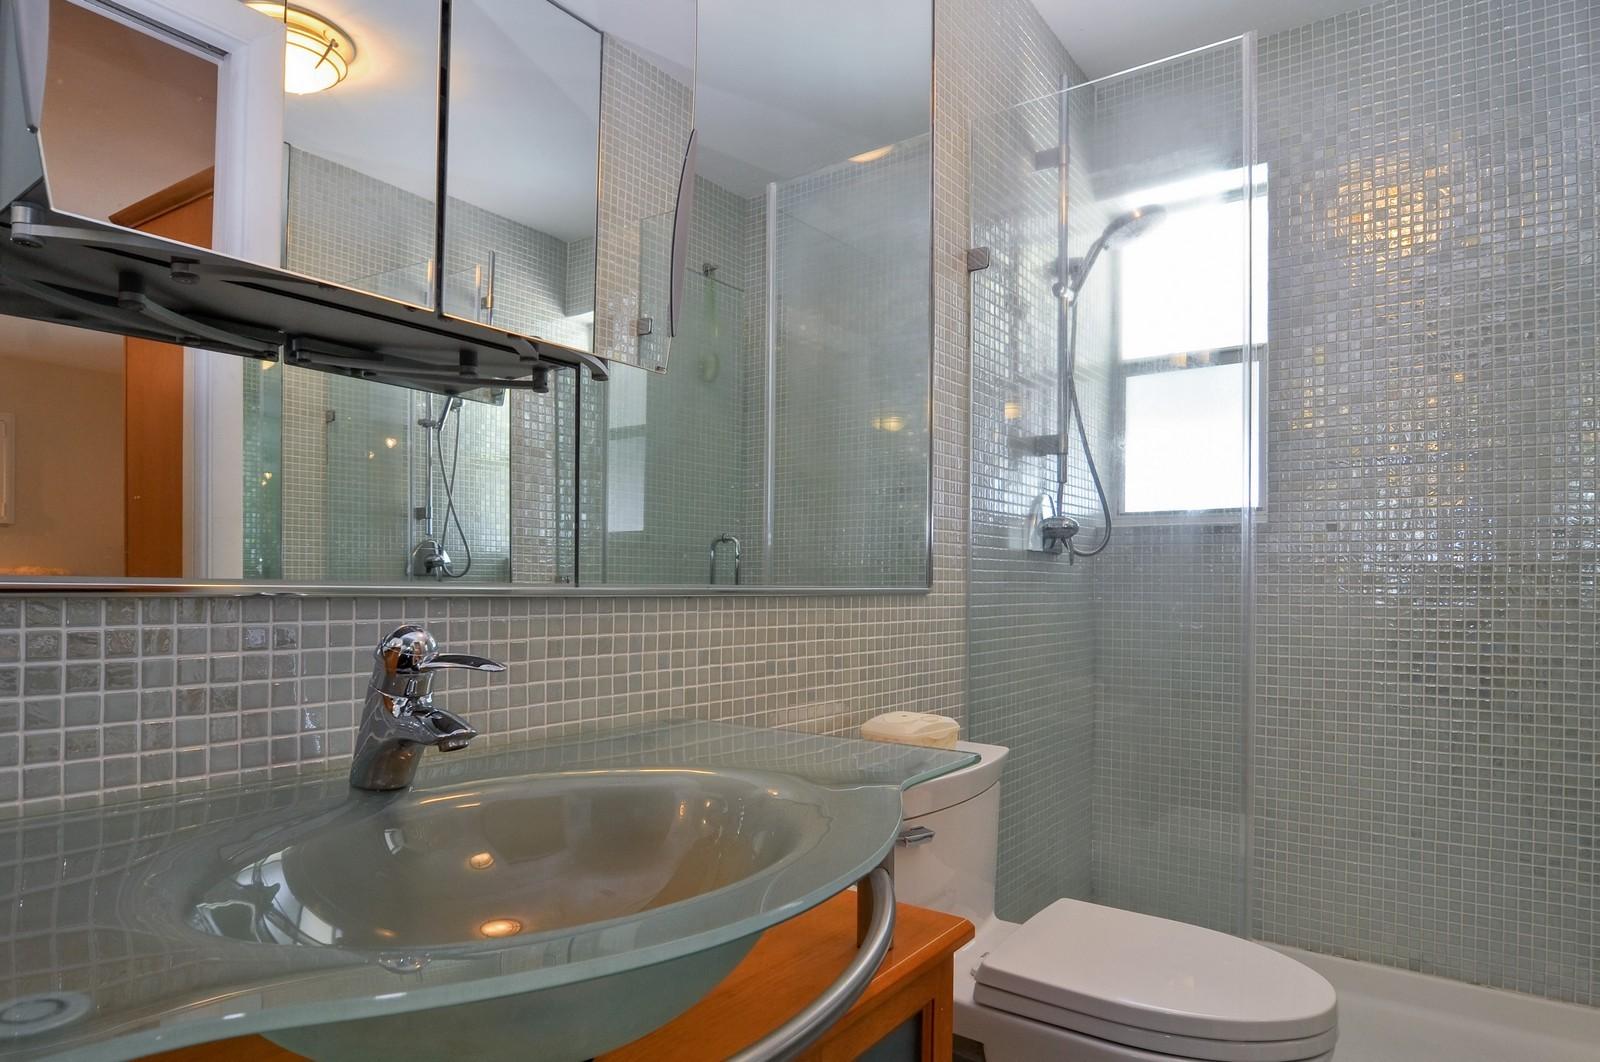 Real Estate Photography - 2010 NE 121st Rd, Miami, FL, 33181 - Master Bathroom